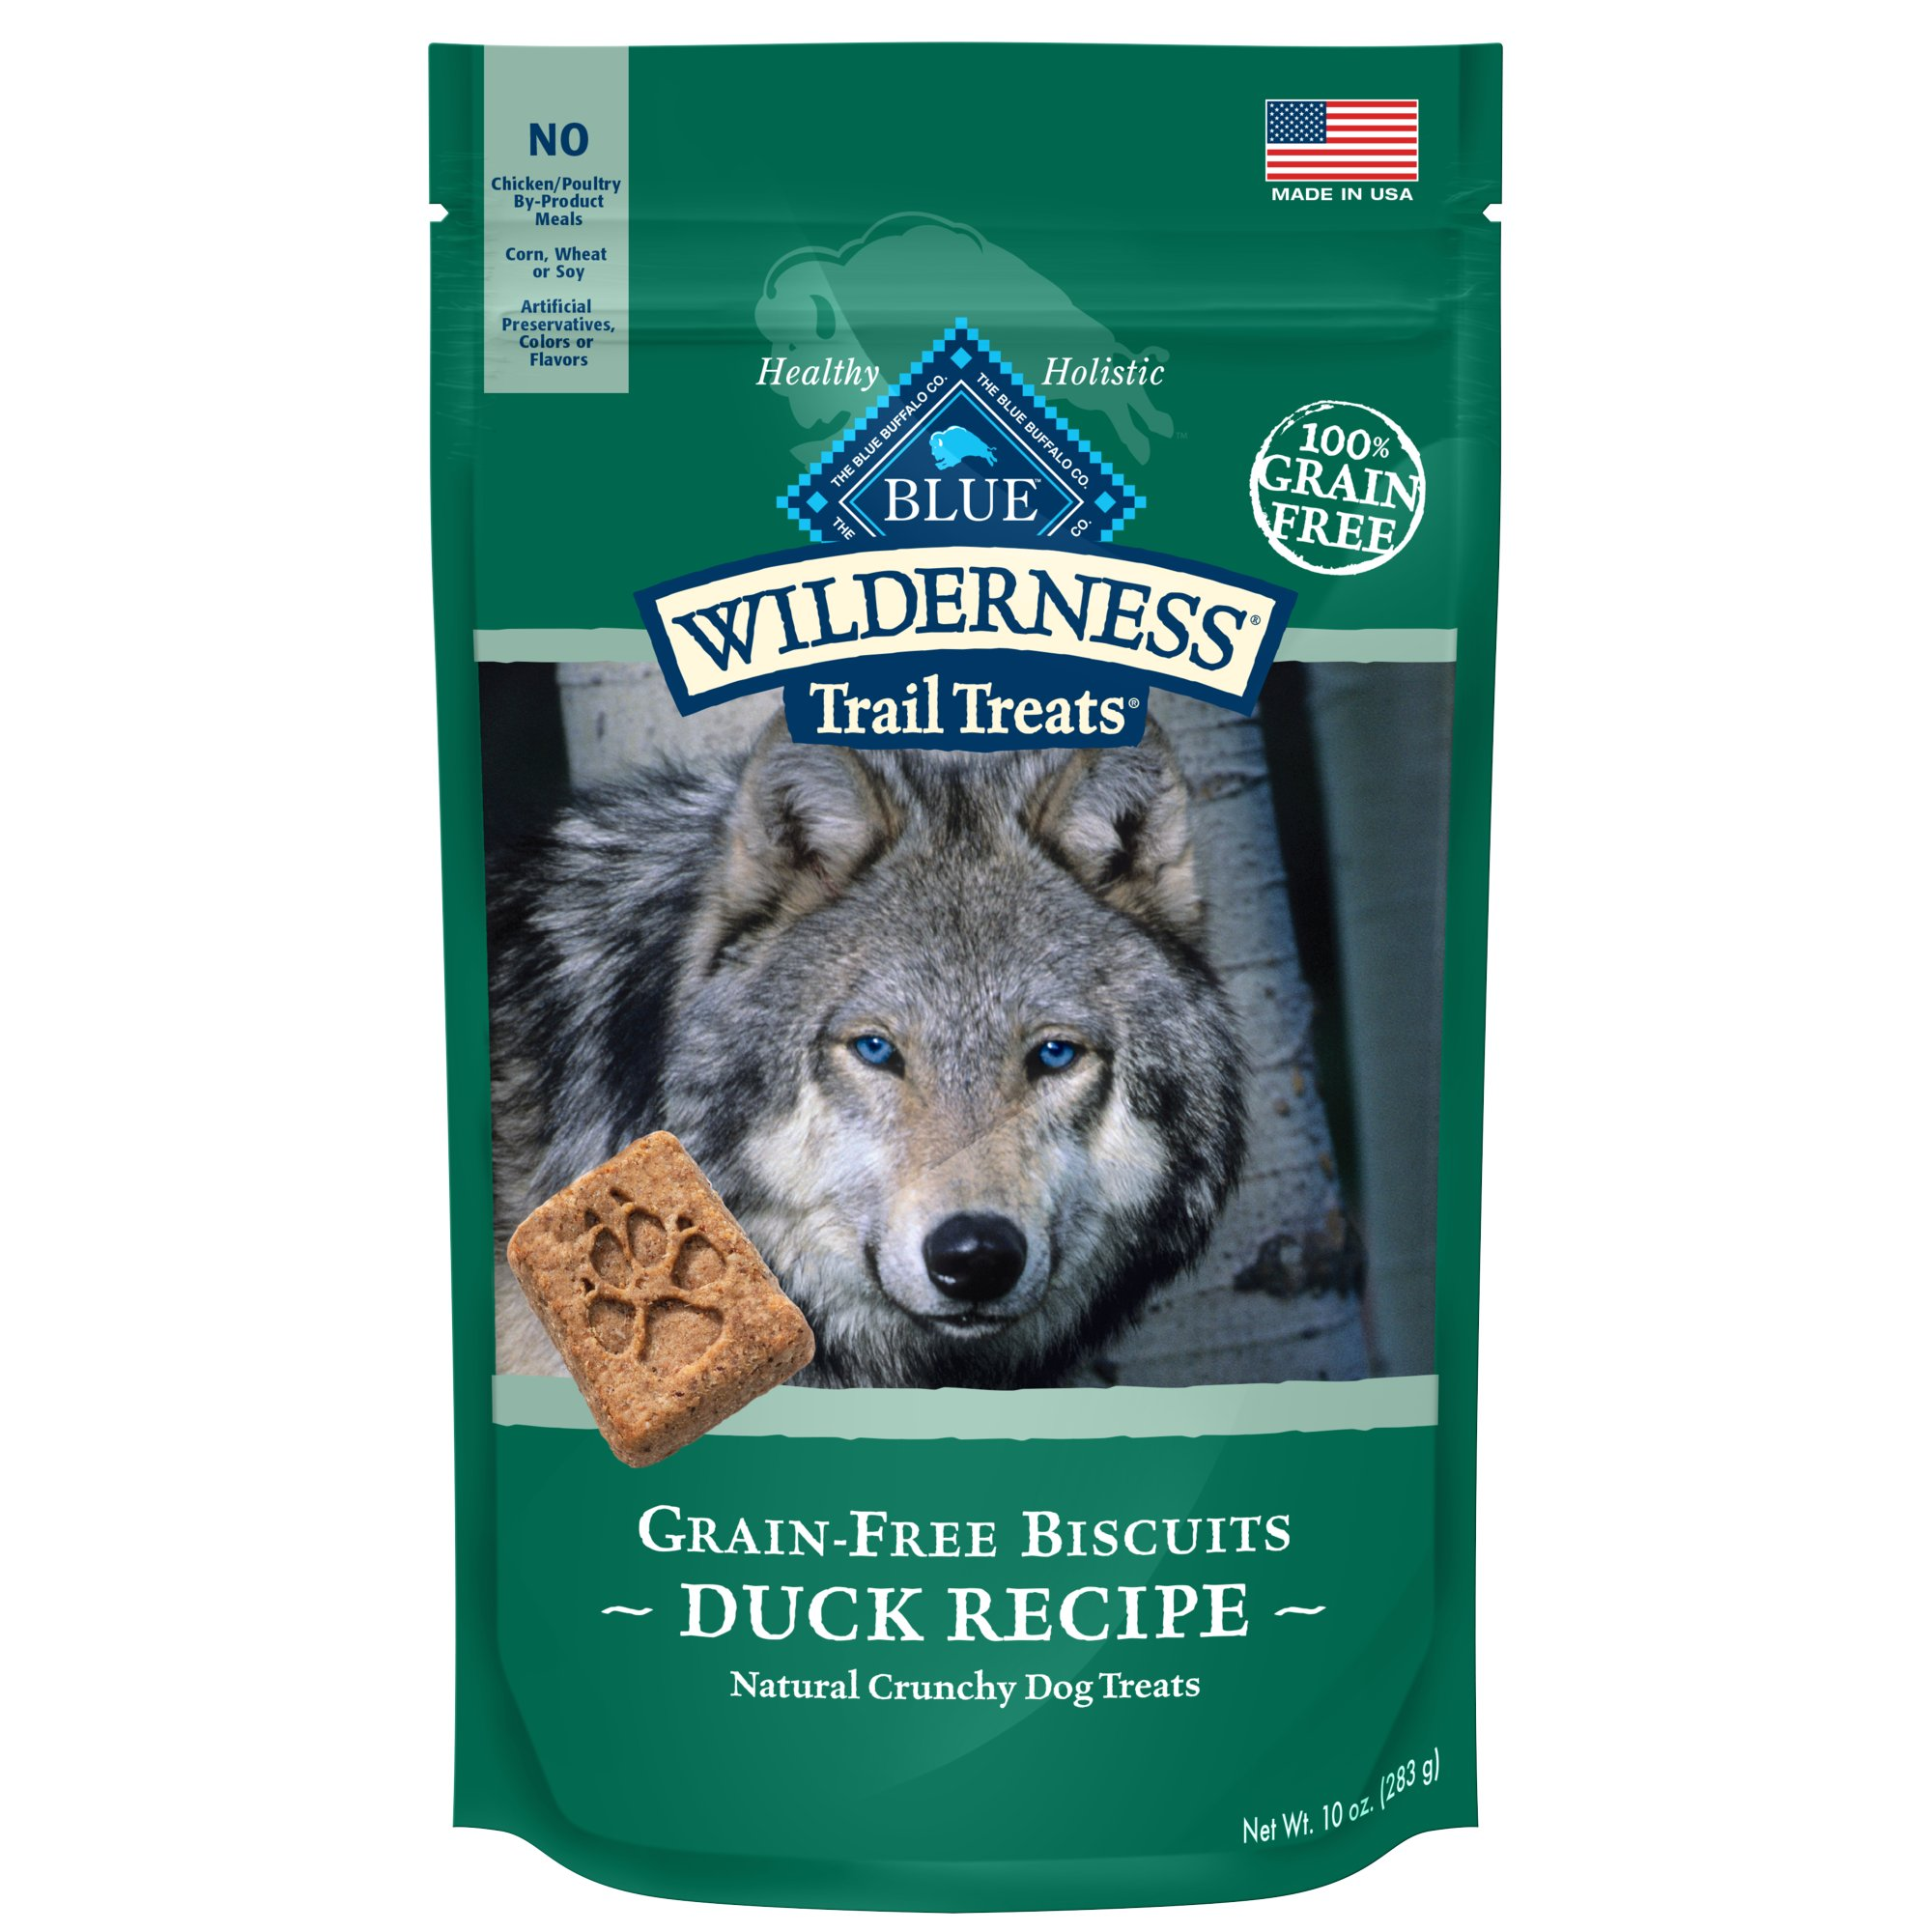 Blue Buffalo Wilderness Trail Treats Grain-Free Duck Dog Biscuits